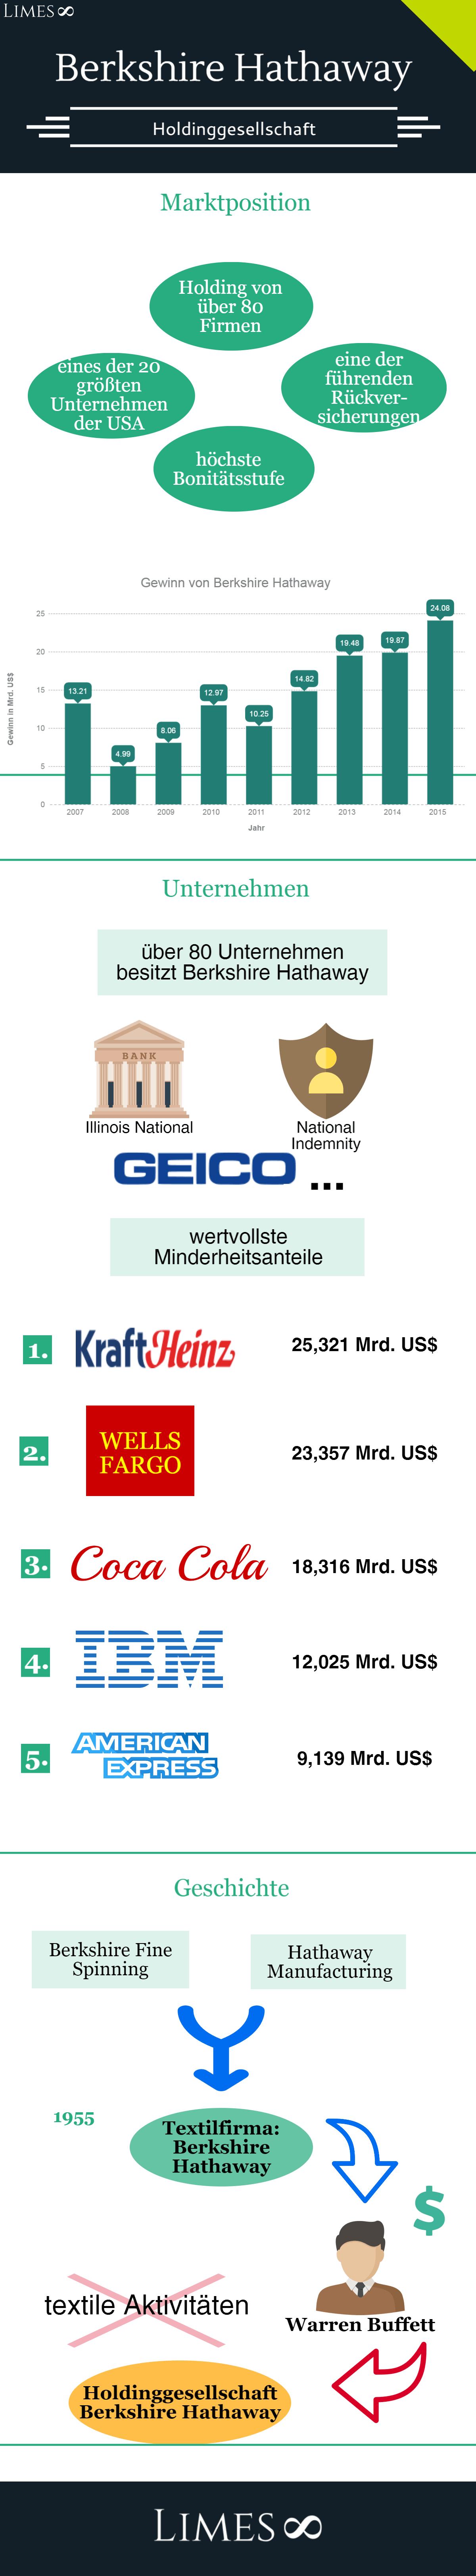 Infografik über Berkshire Hathaway